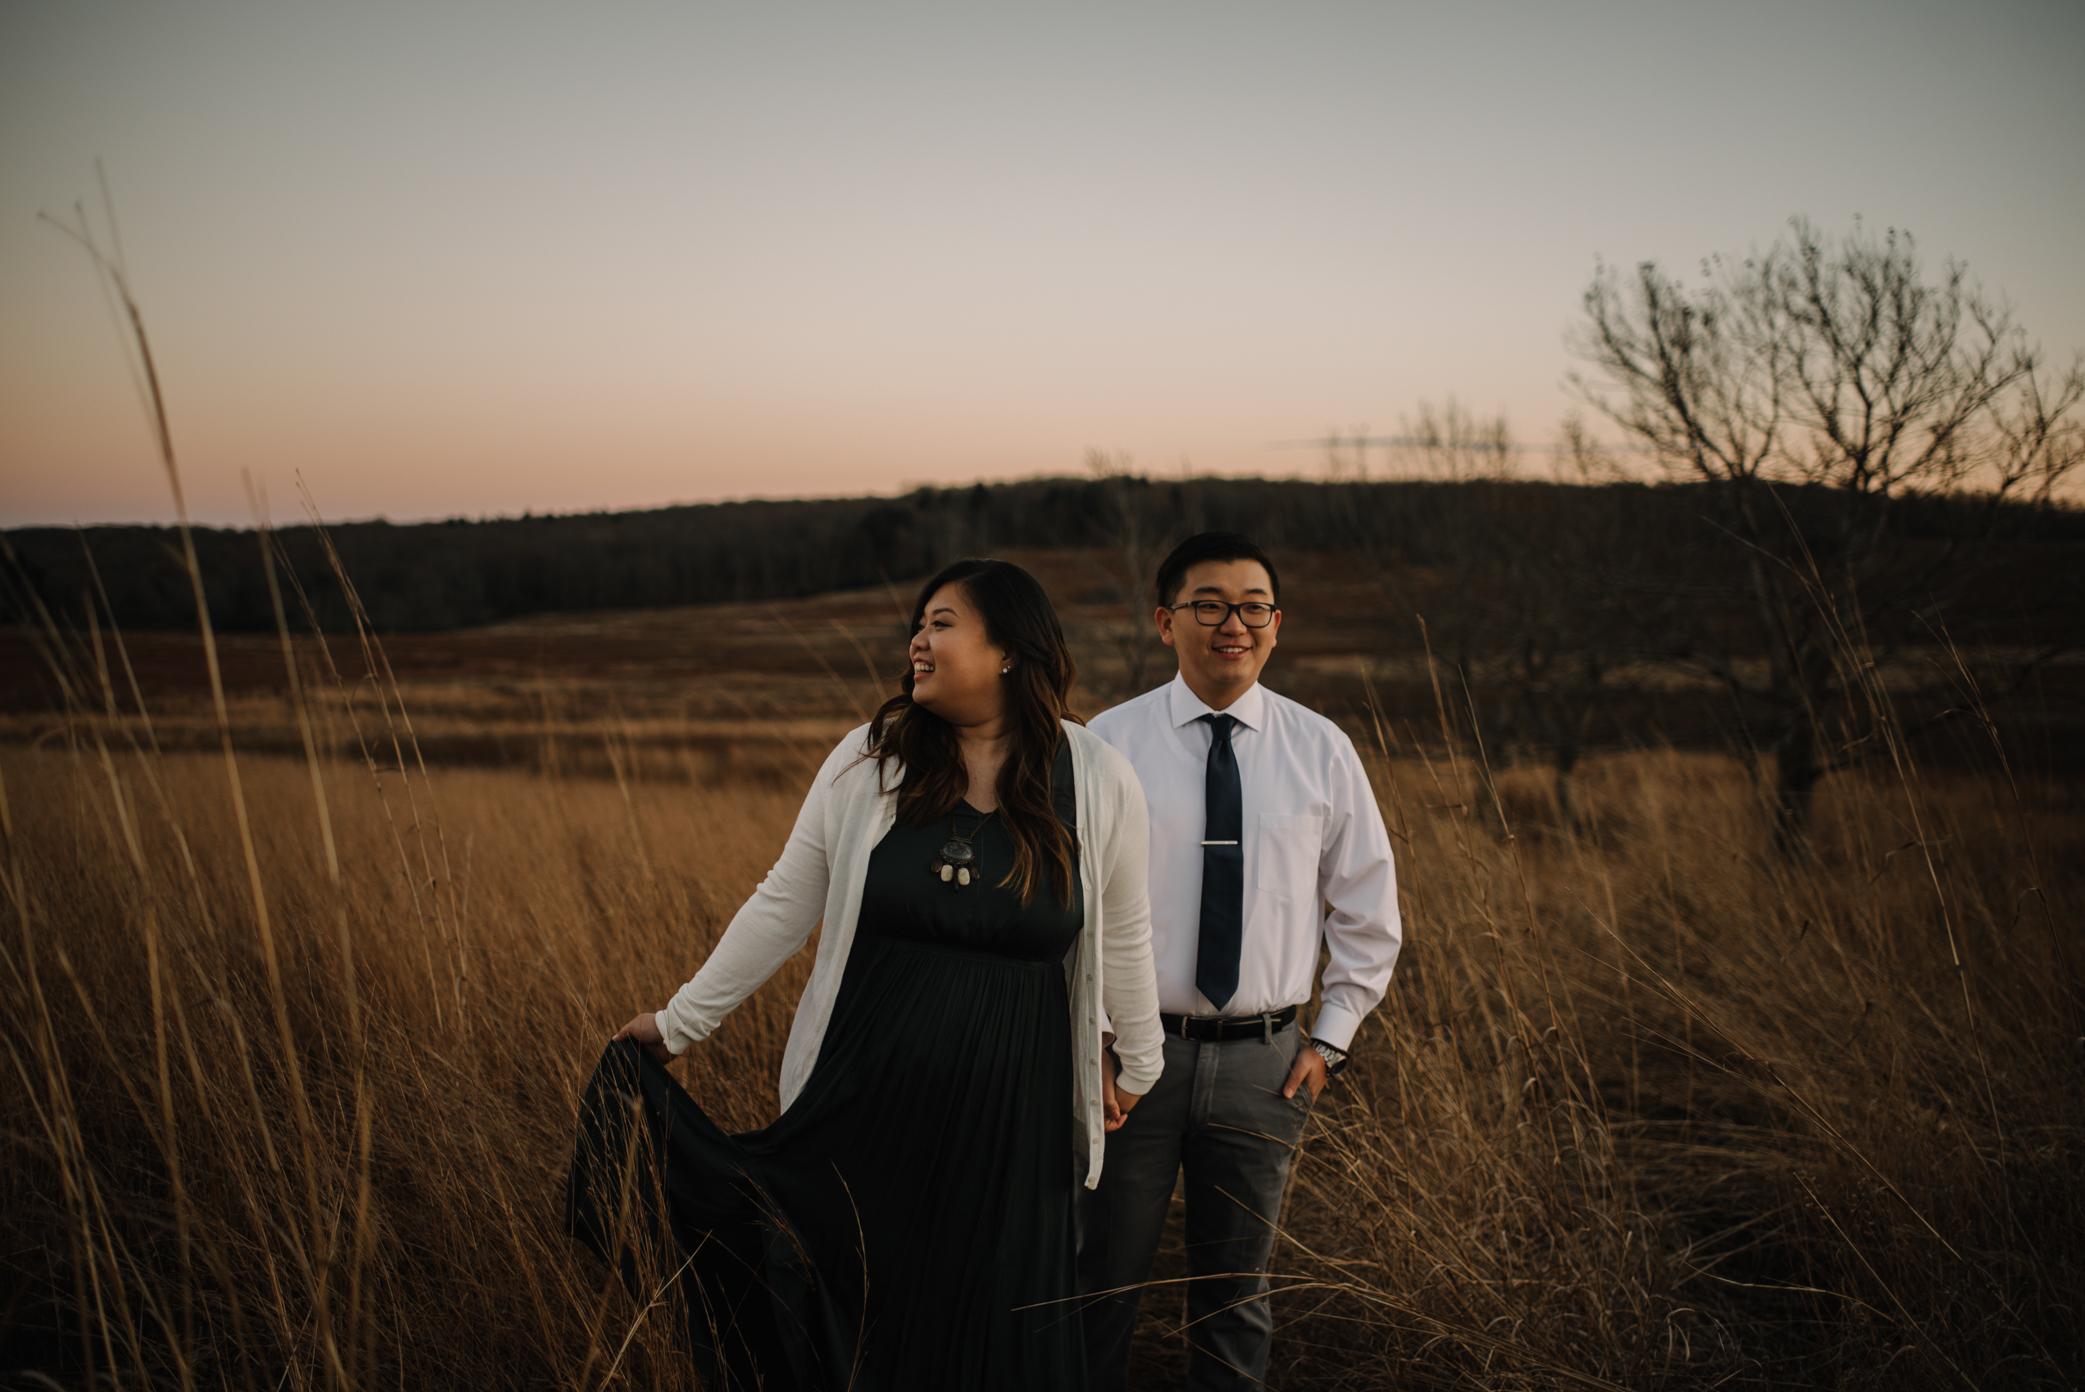 Joshua and Kristina - Shenandoah National Park - Skyline Drive - Winter Engagement Session Photographer - White Sails Creative_39.JPG